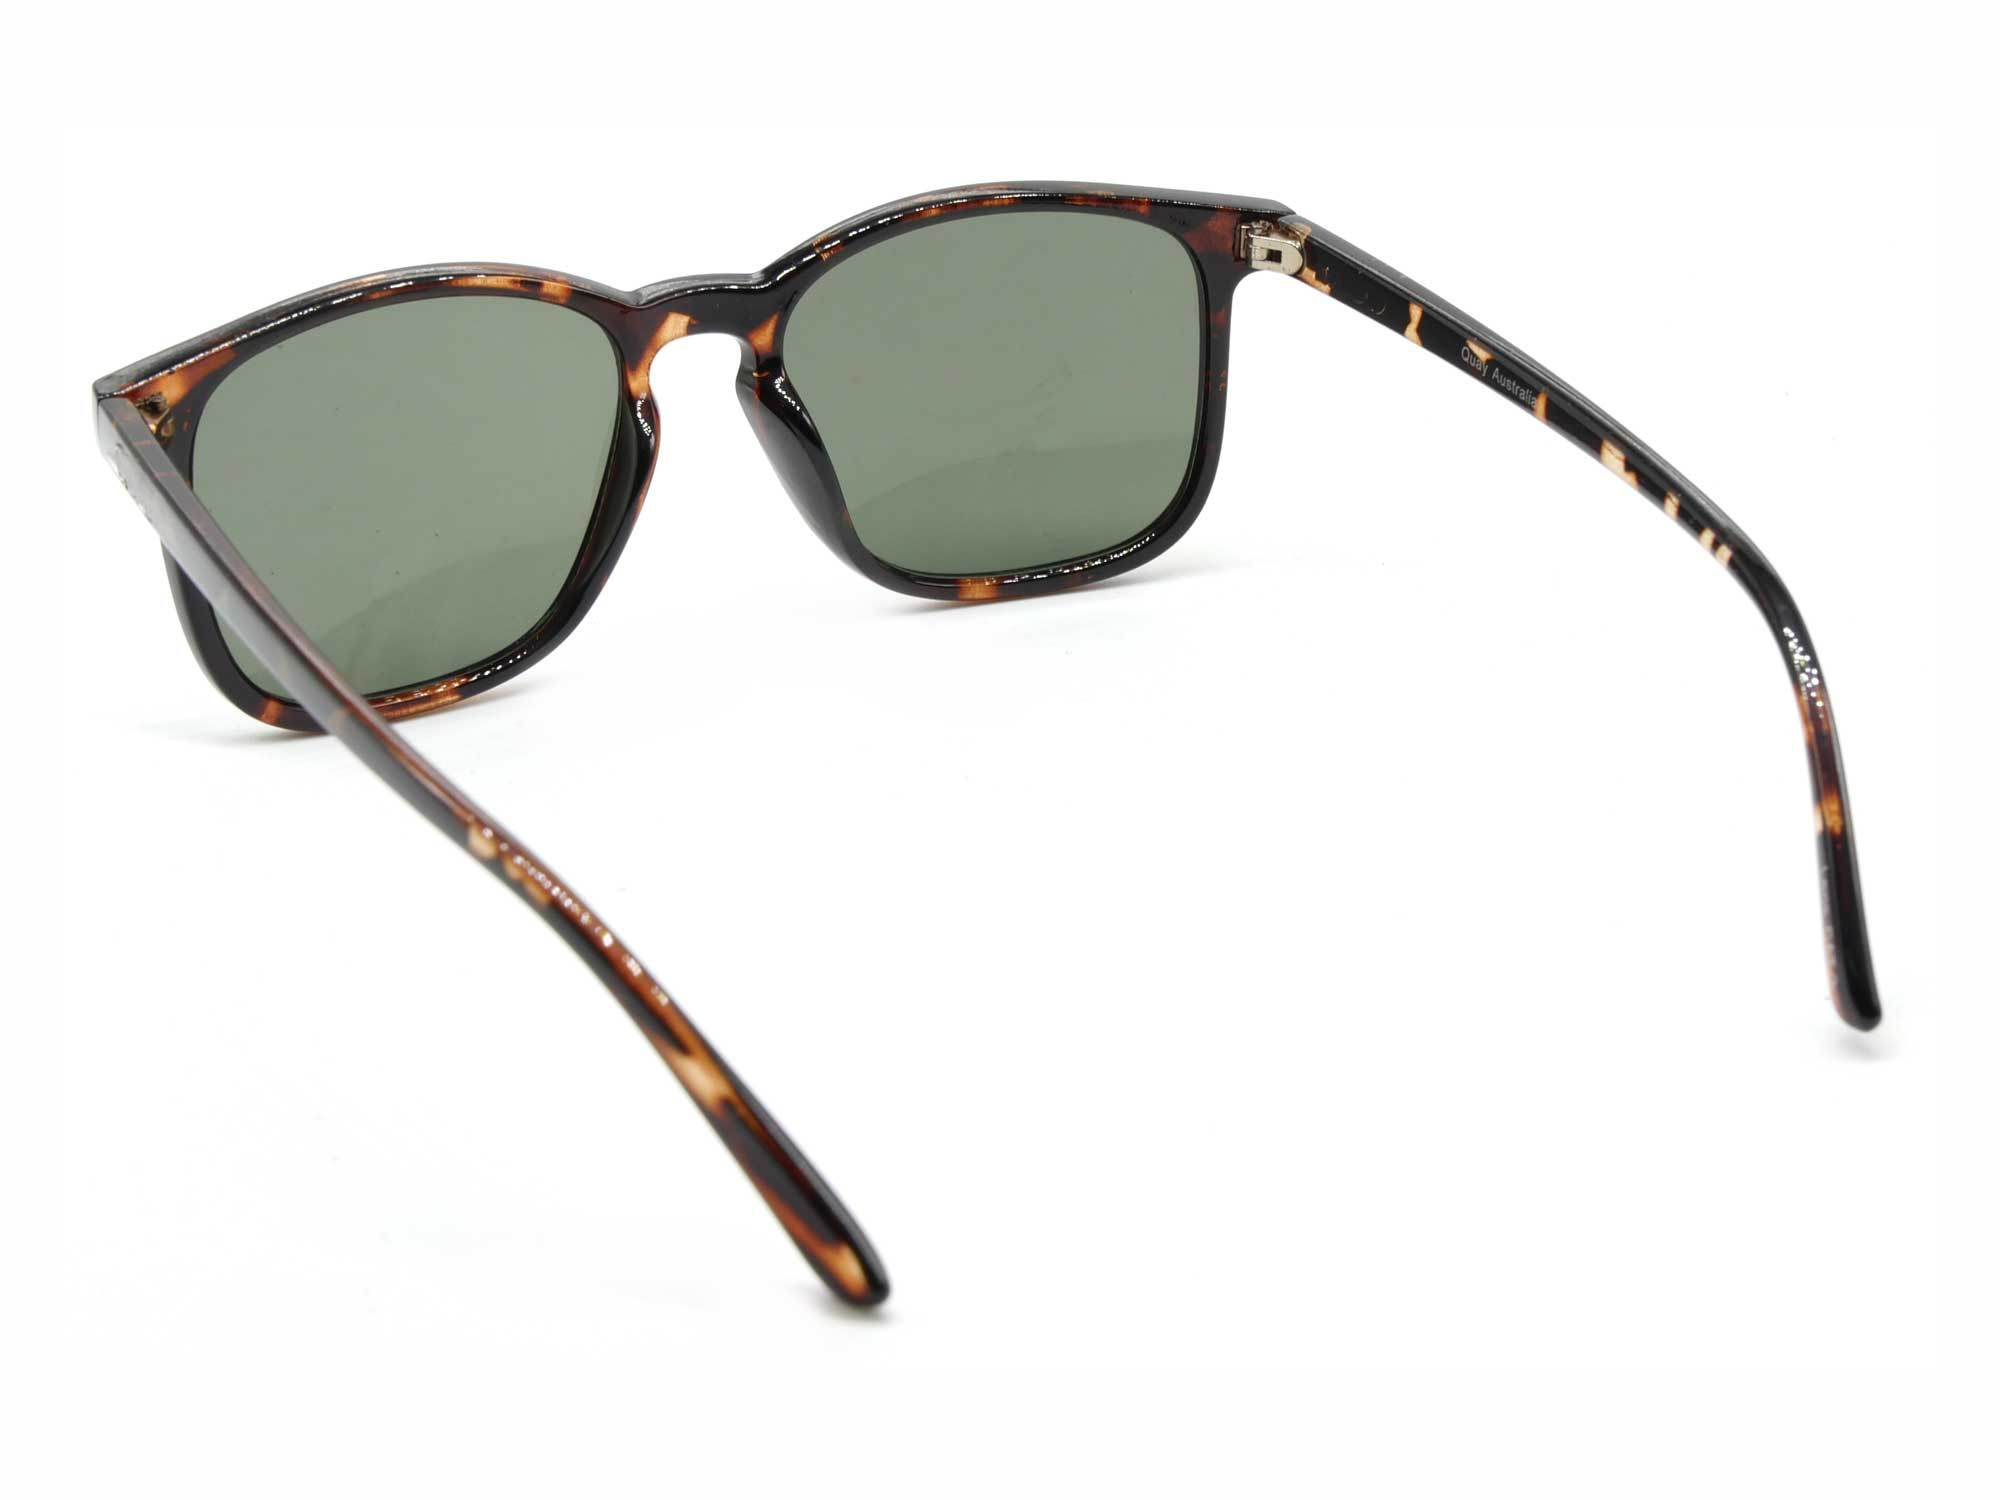 2017 Australia Brands OEM Promotional UV400 Polarized Fashion Sunglasses